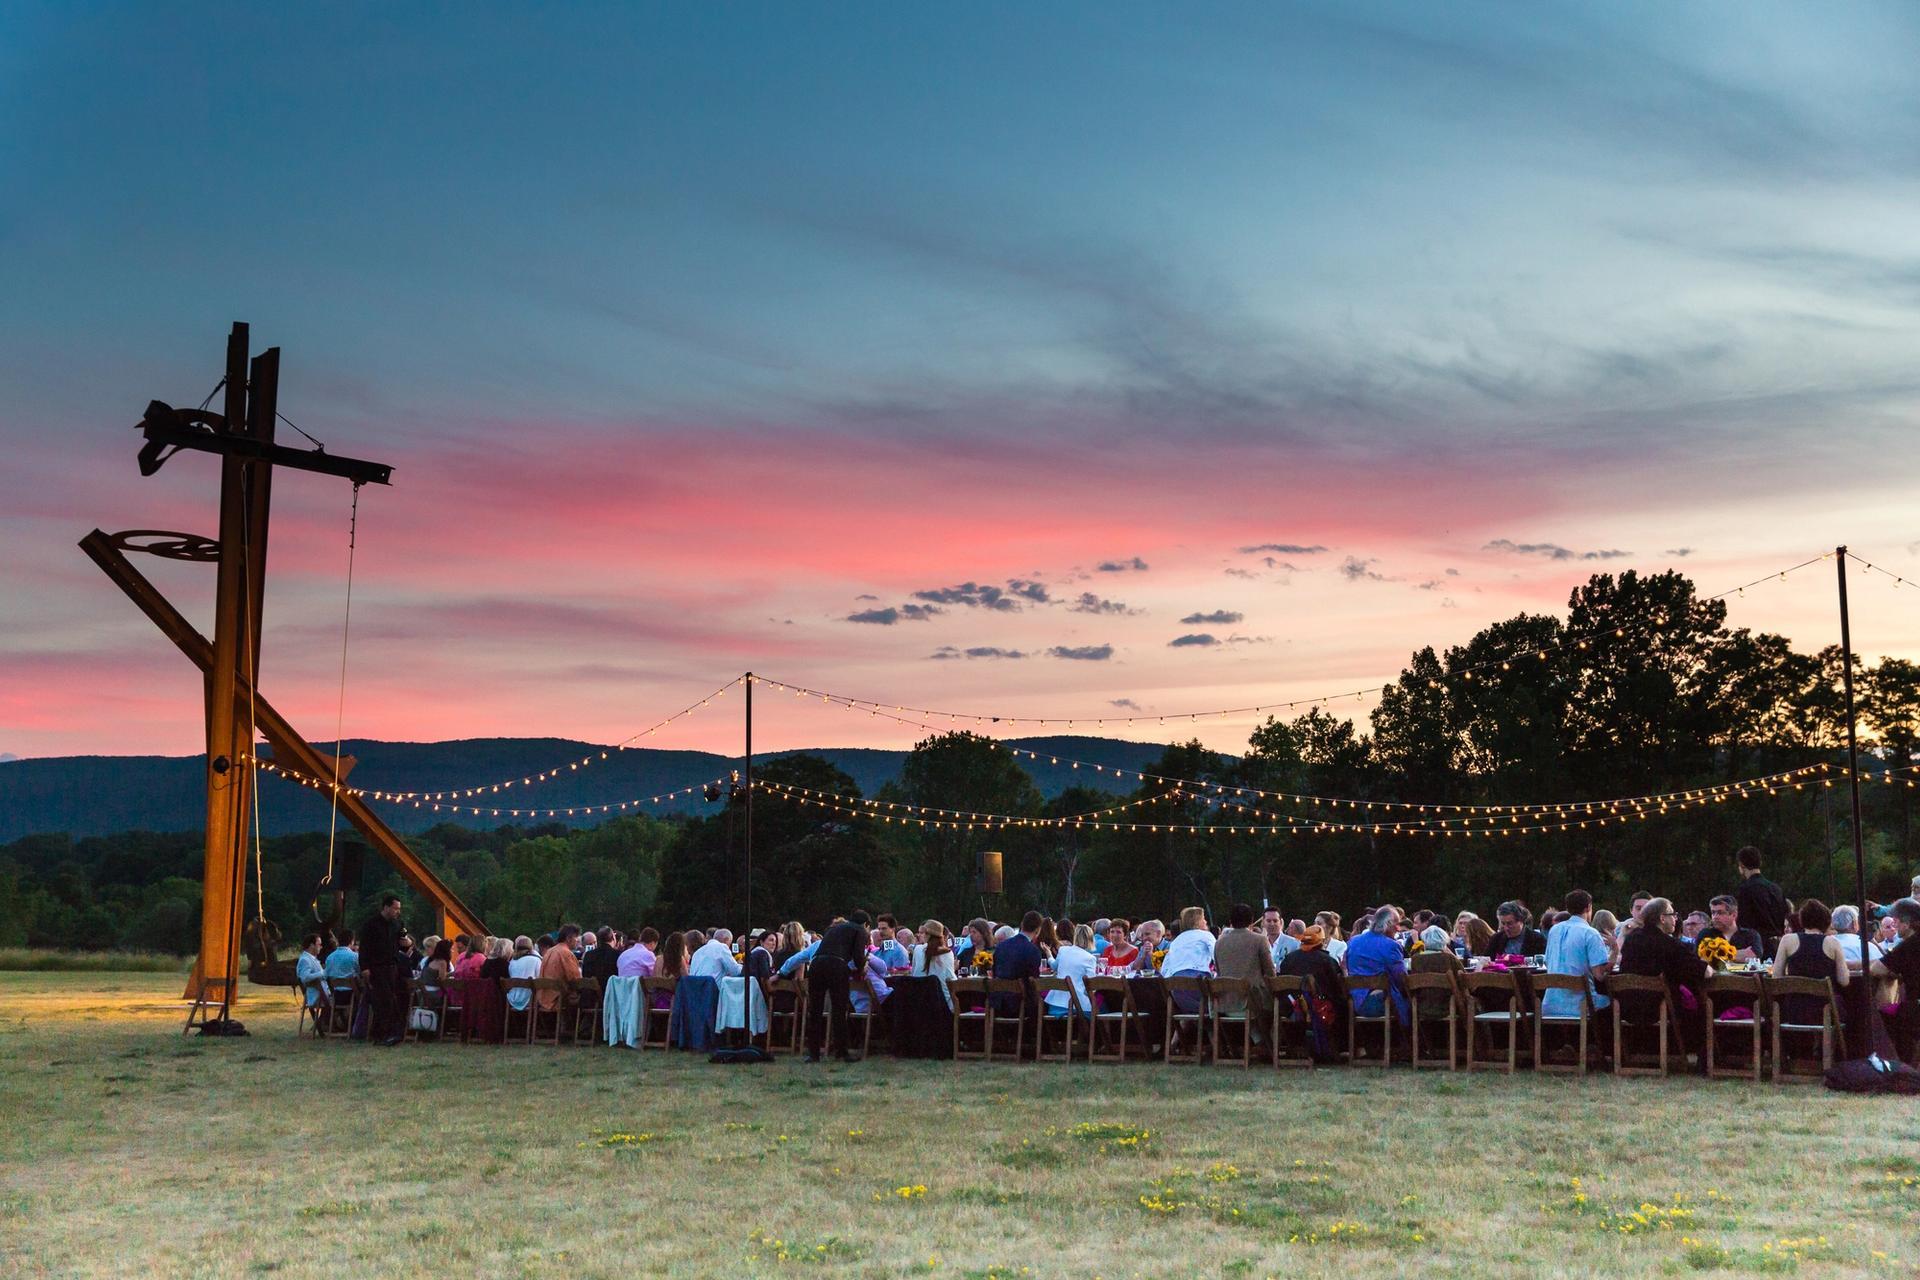 Storm King's Summer Solstice dinner in 2017 Photo: Vladimir Weinstein/BFA.com. Courtesy of Storm King Art Center.